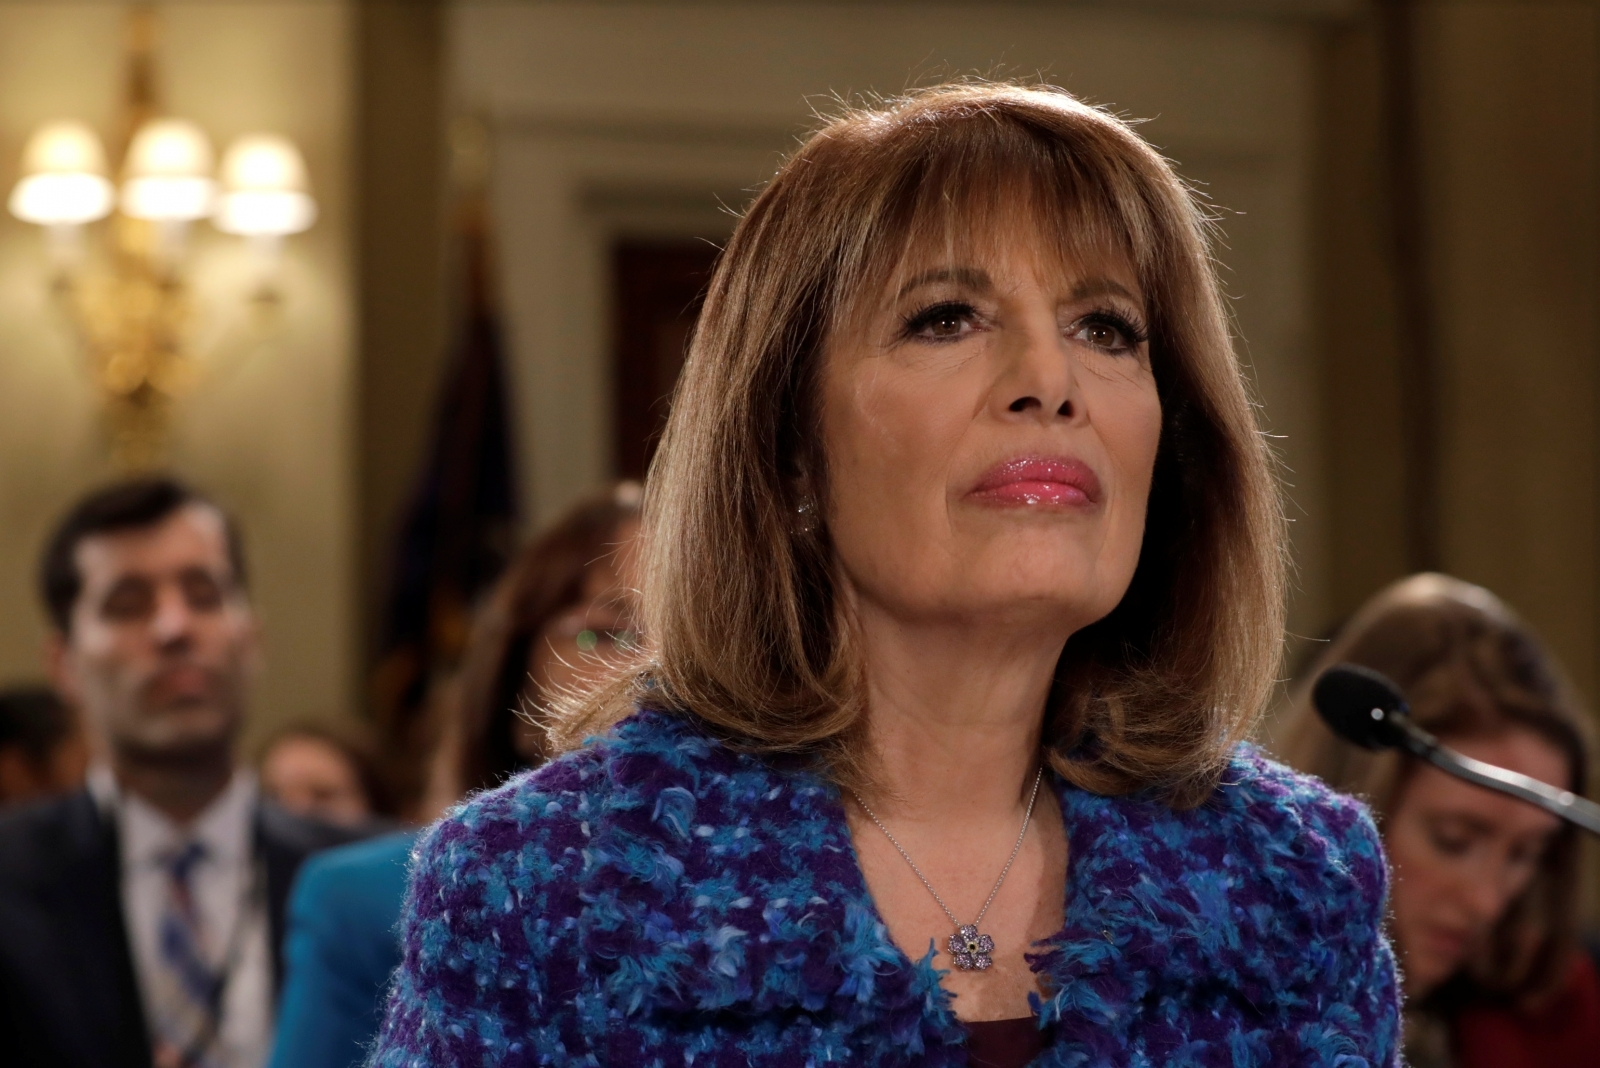 Congresswoman Alleges Staff Had Genitals Grabbed On The